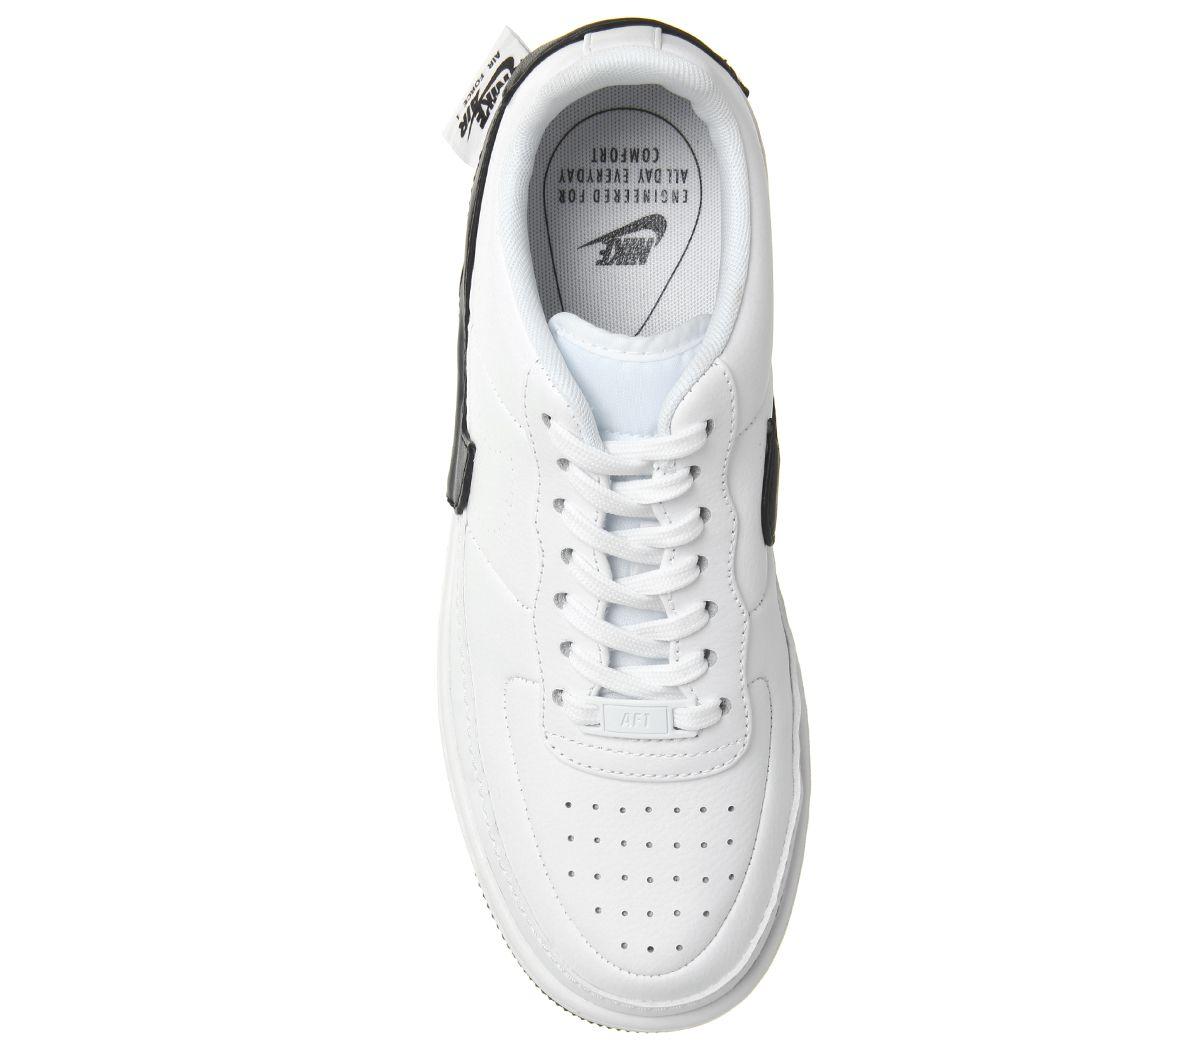 on sale 847ee debd7 Nike AF1 Jester XX White Black - Hers trainers